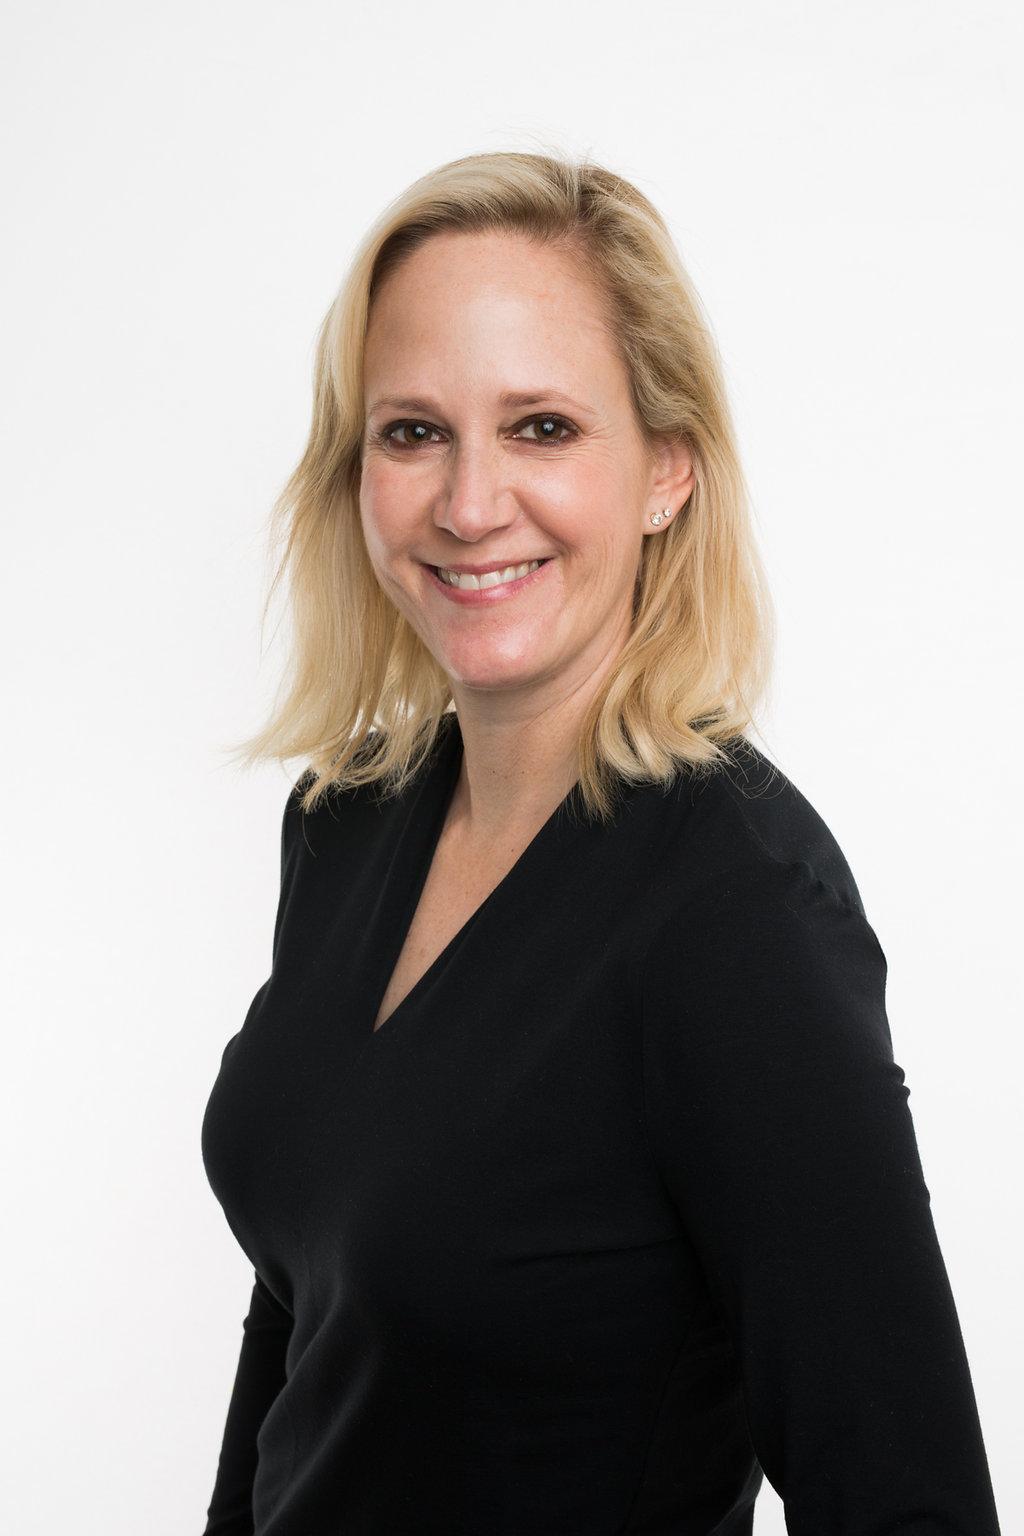 Dr.Terri Bonenberger